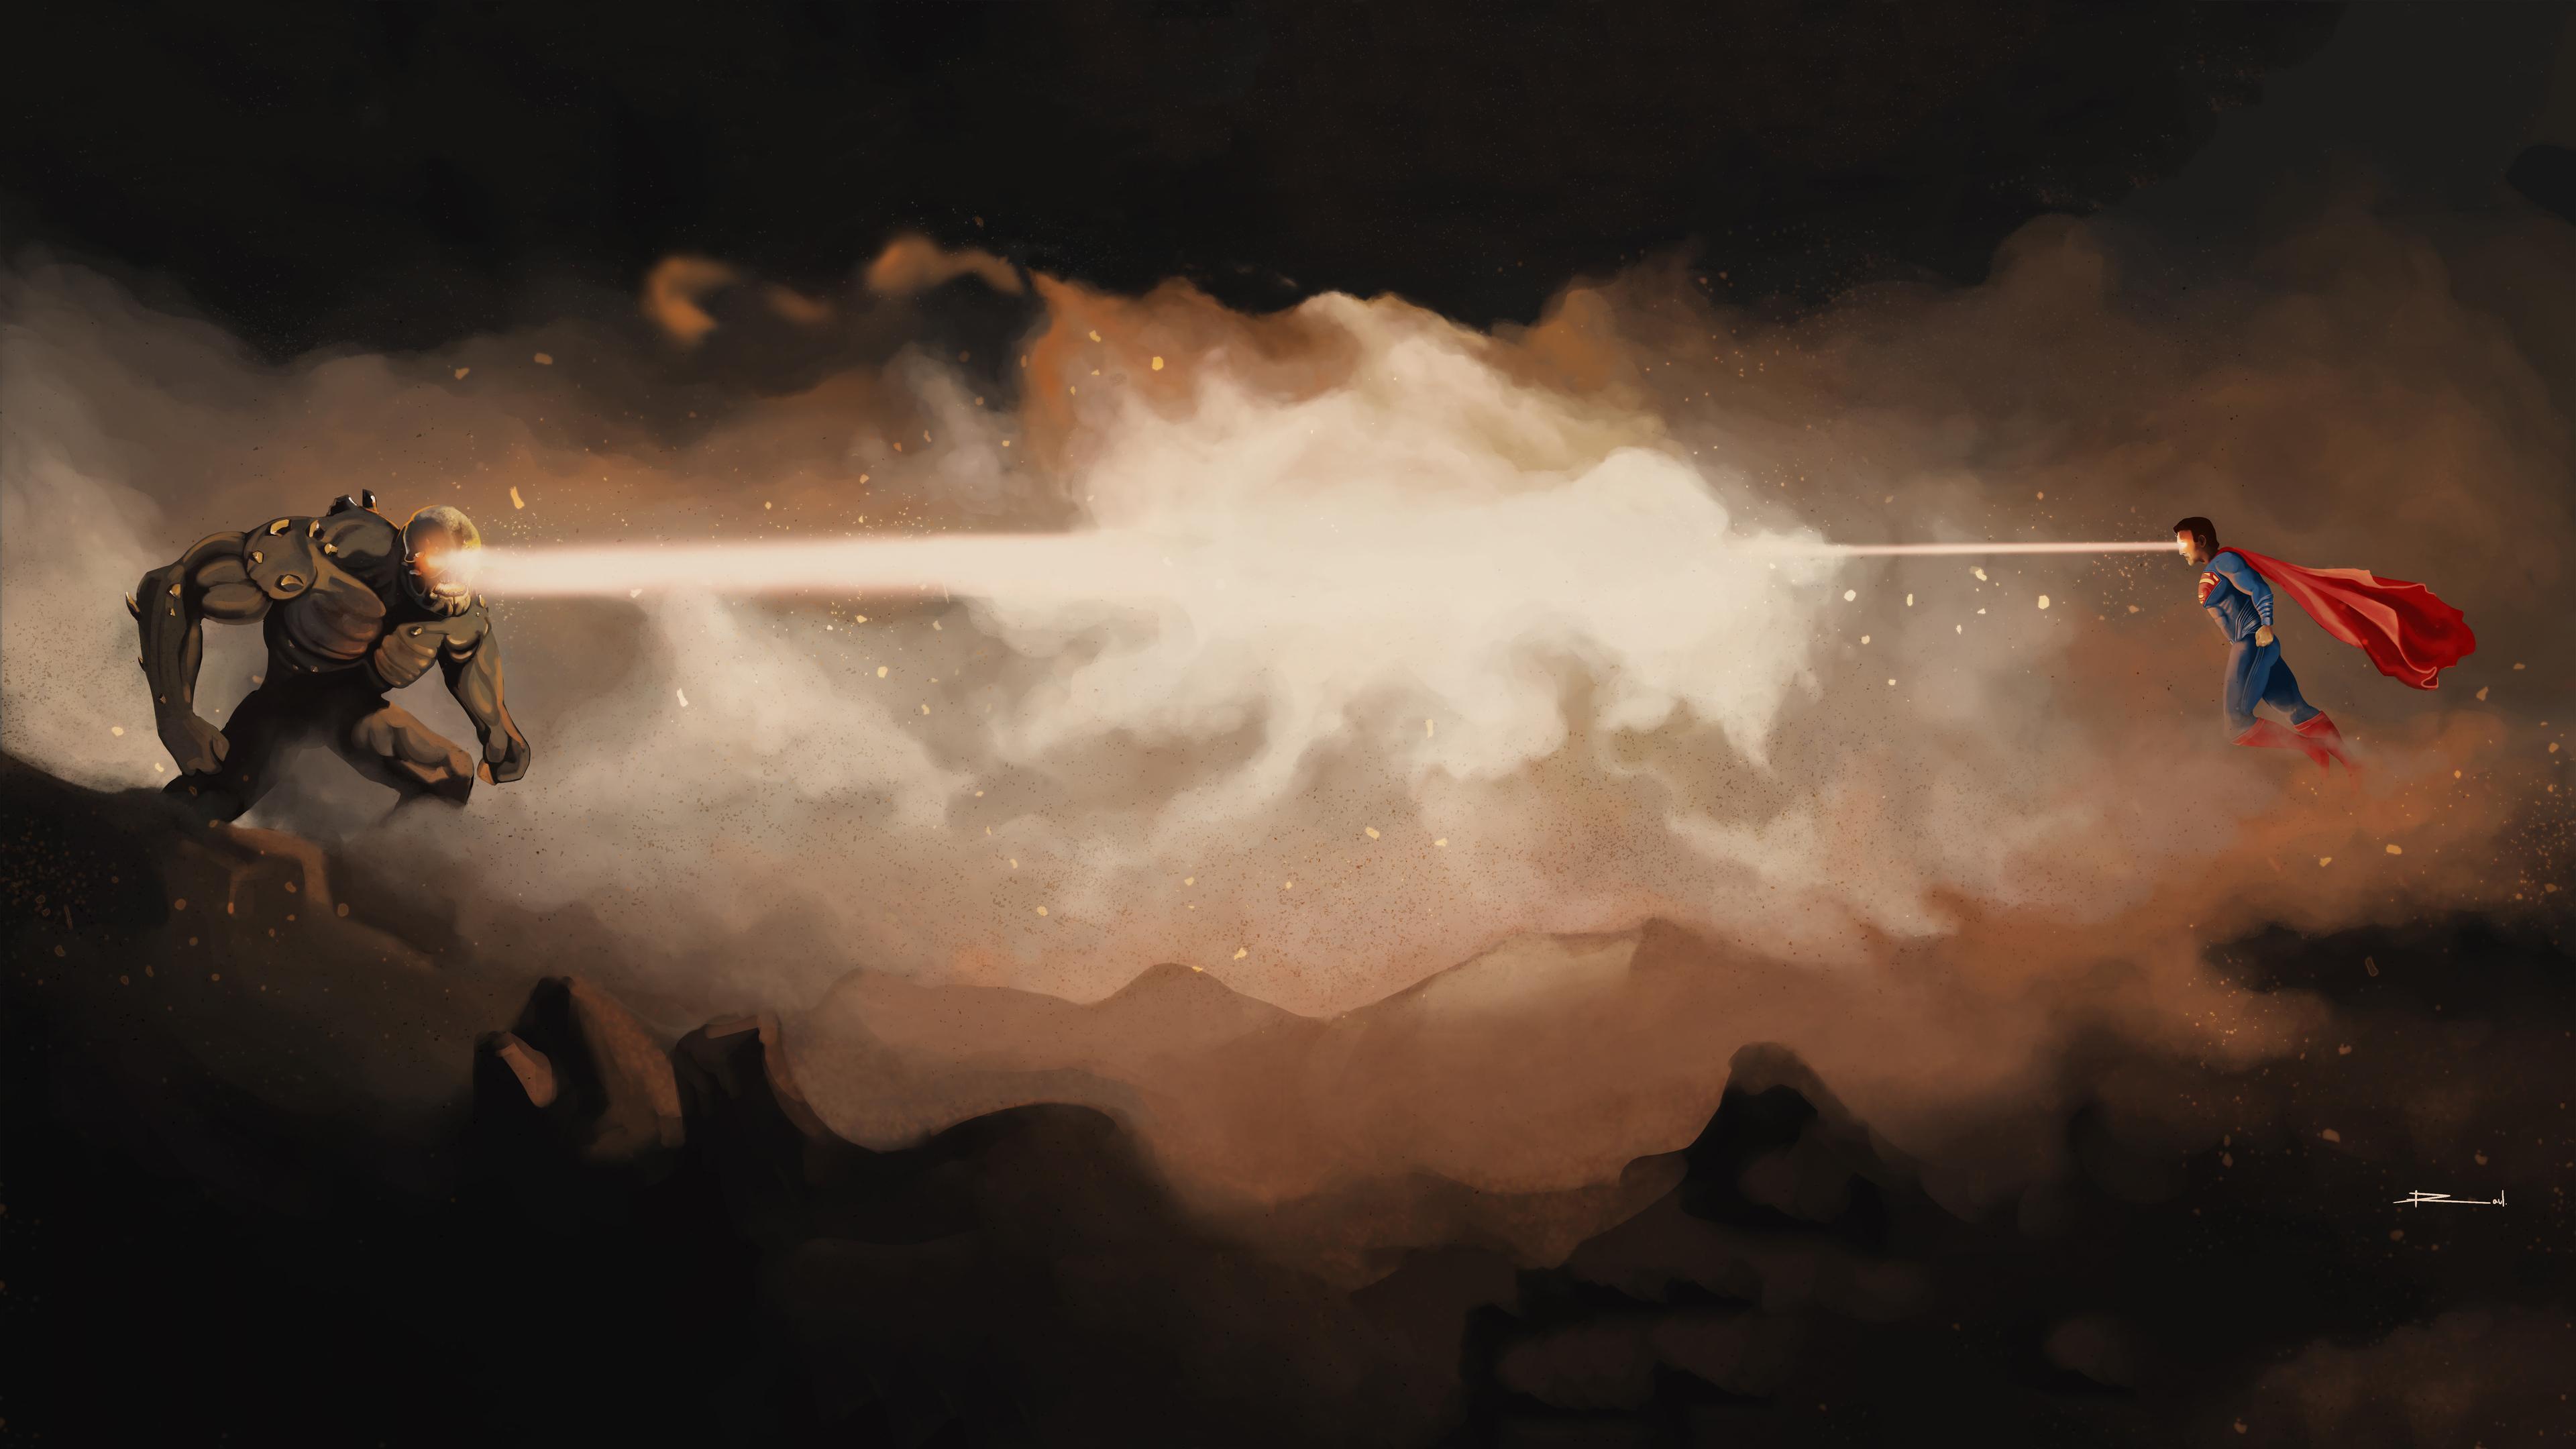 doomsday vs superman 4k 1544923160 - Doomsday Vs Superman 4k - superman wallpapers, superheroes wallpapers, hd-wallpapers, doomsday wallpapers, deviantart wallpapers, artwork wallpapers, 4k-wallpapers